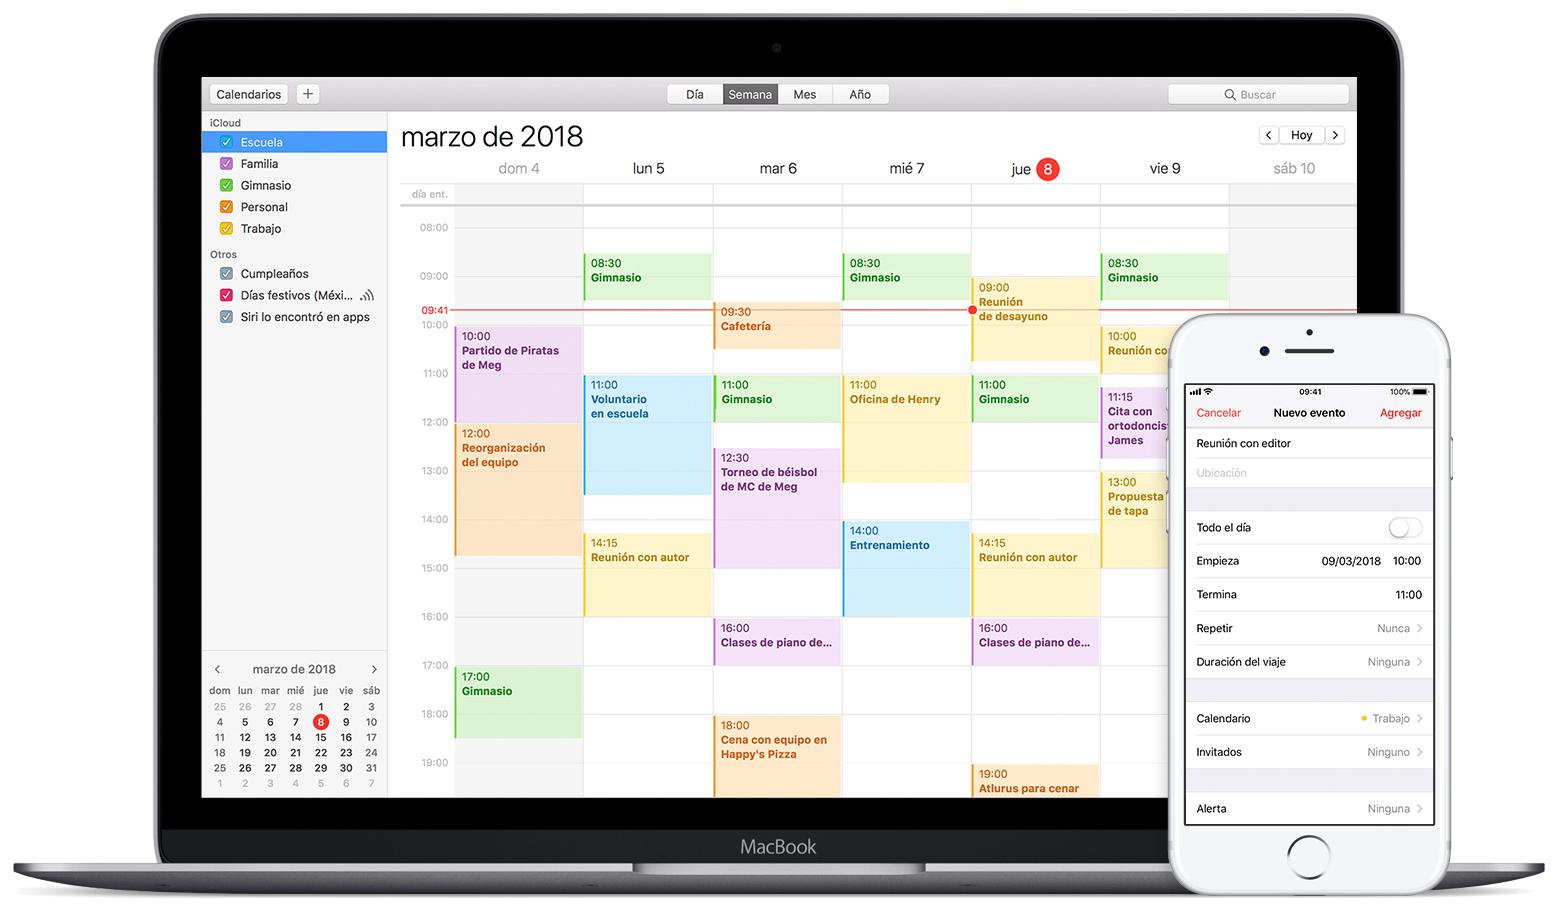 Mantener Calendario actualizado con iCloud - Soporte técnico de Apple